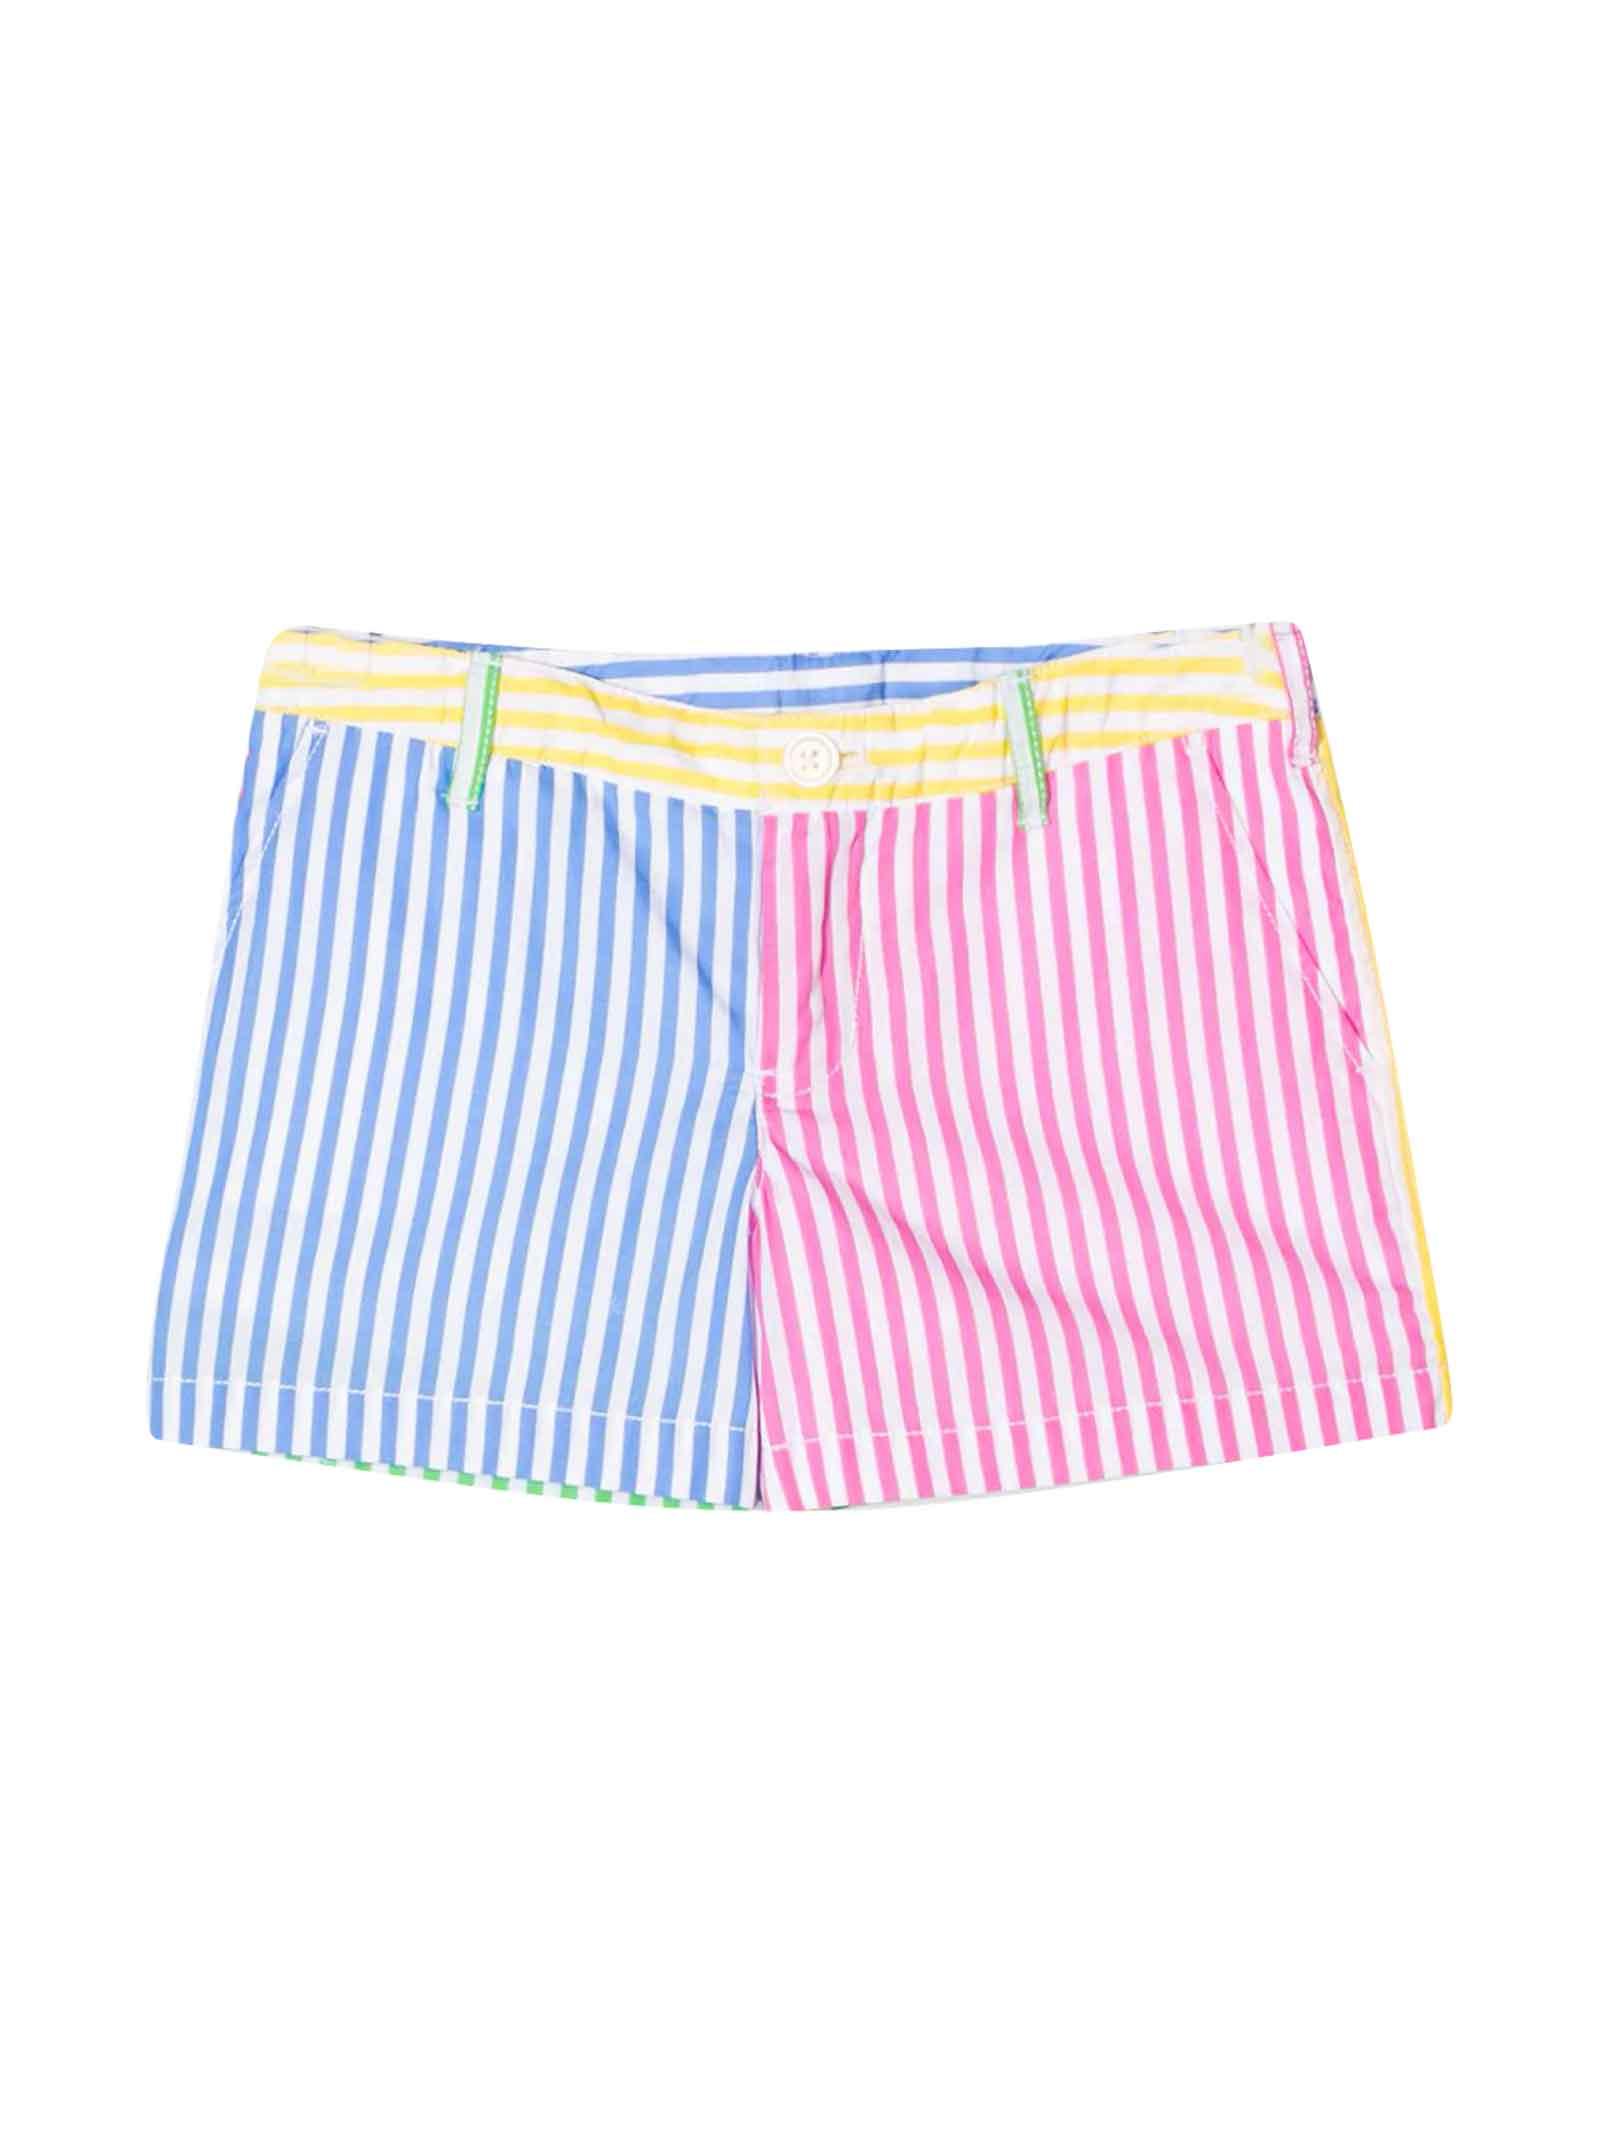 Ralph Lauren Multicolor Shorts With Lines